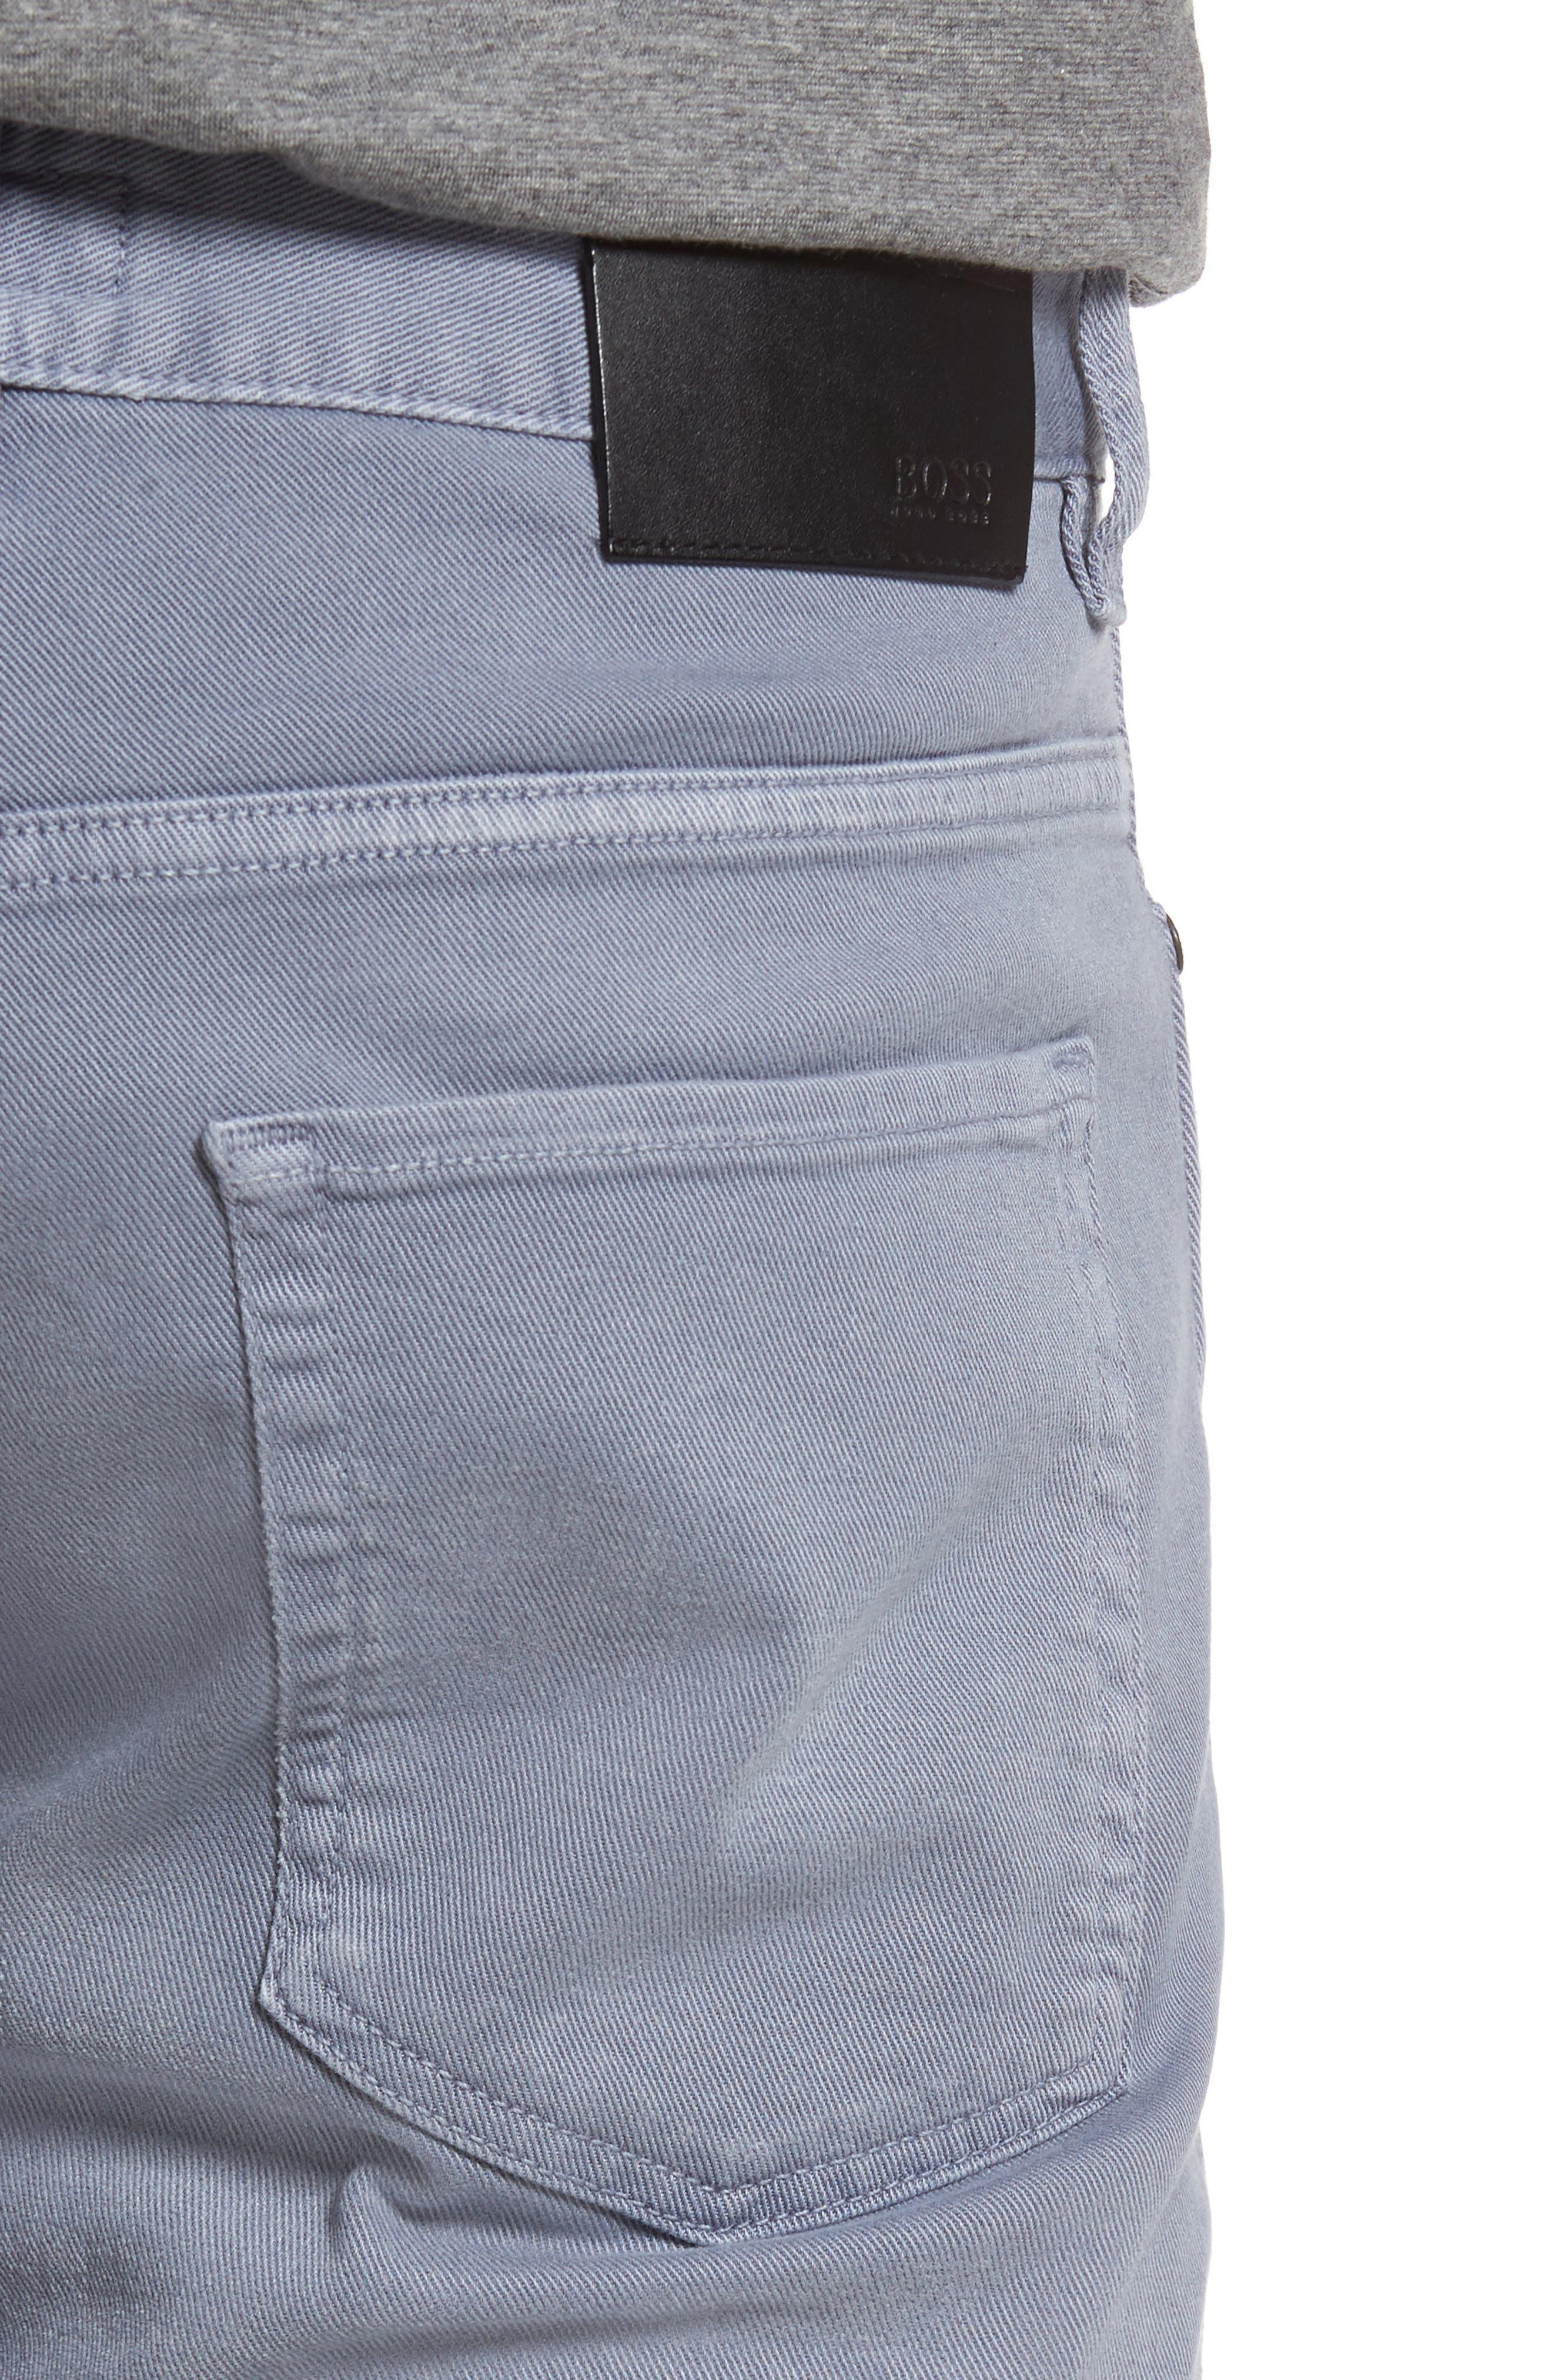 Delaware Slim Fit Jeans,                             Alternate thumbnail 4, color,                             462